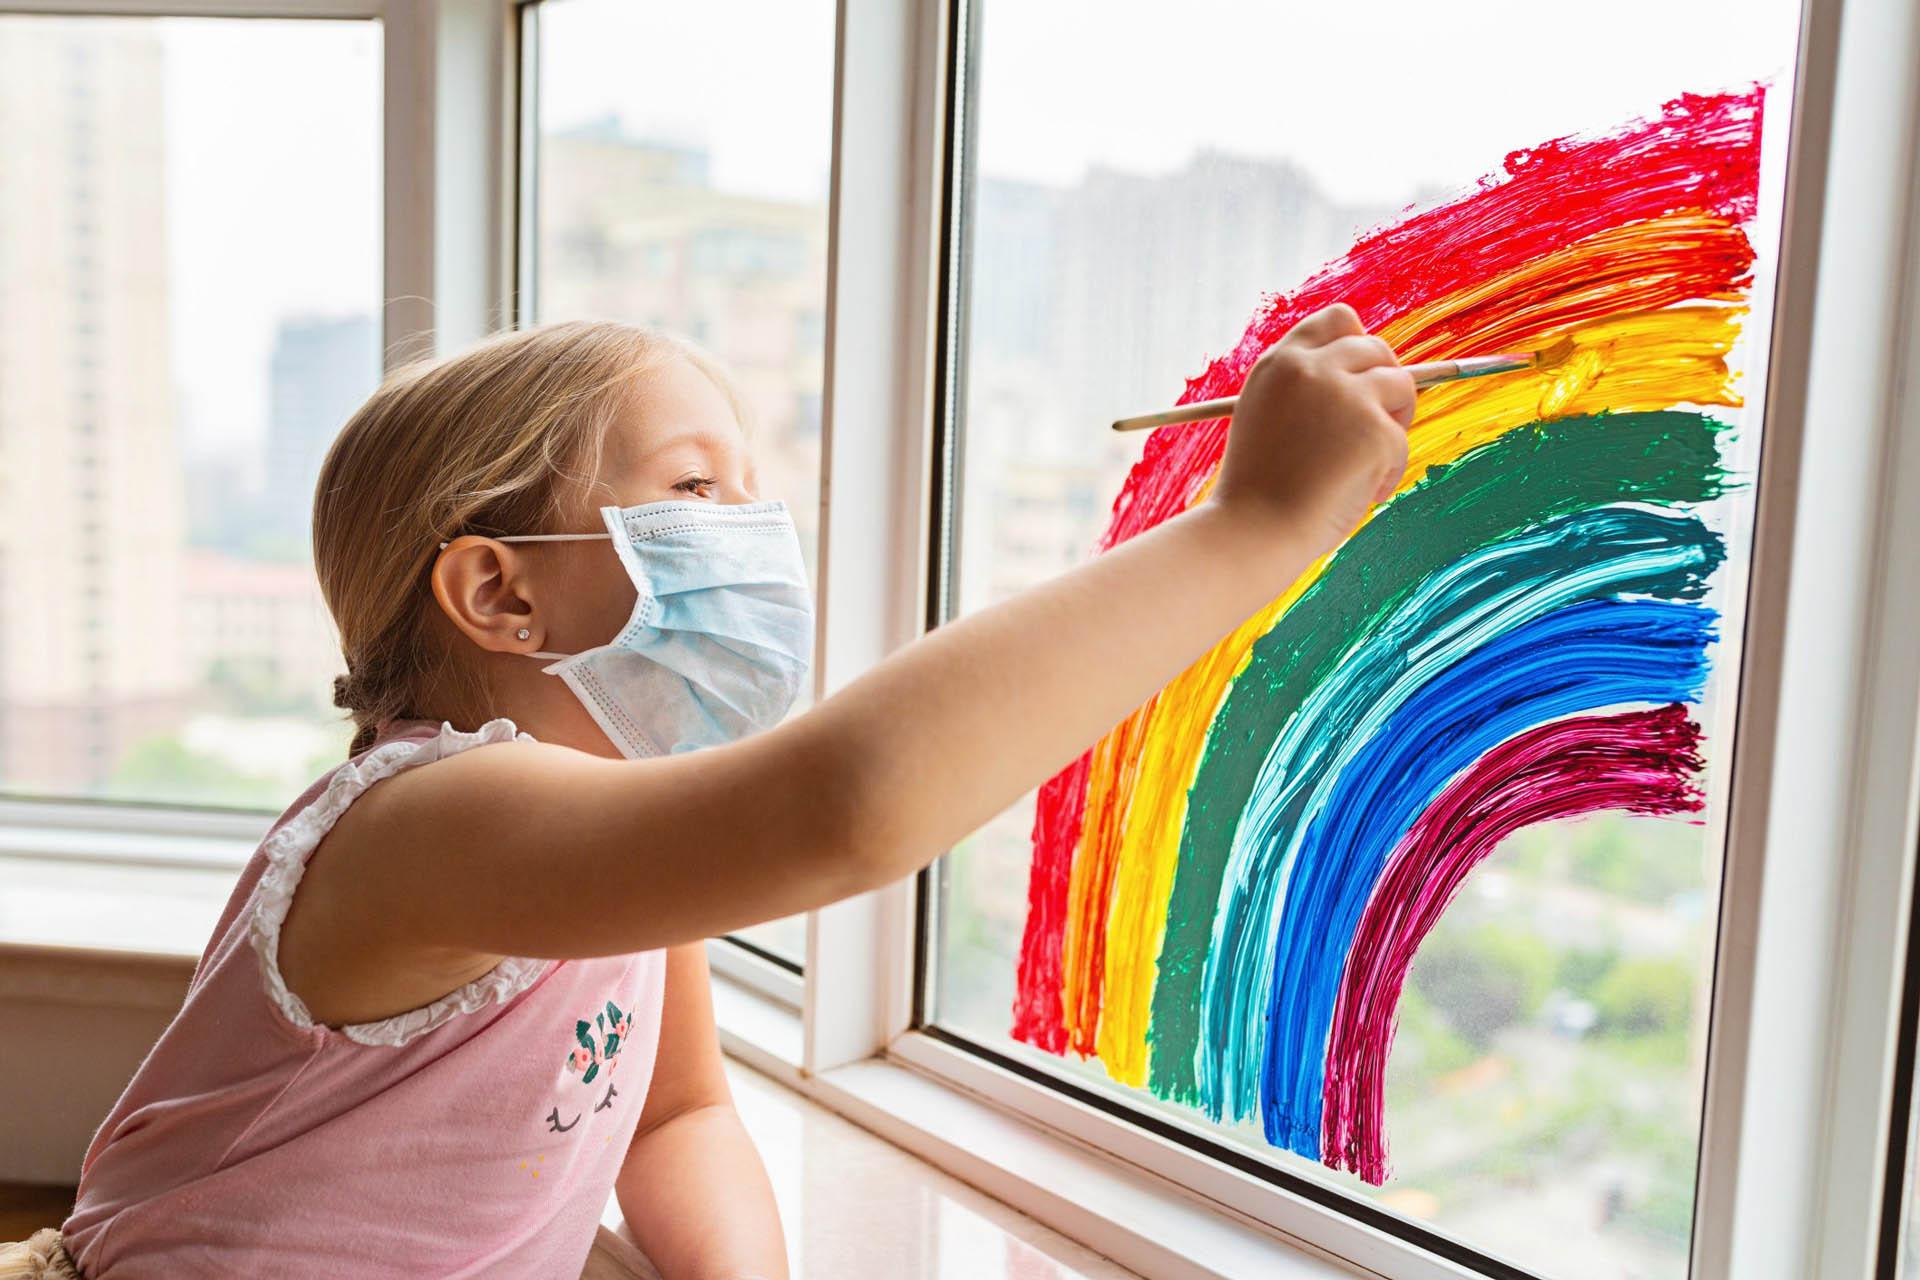 Menina de máscara a pintar na janela um Arco-Íris